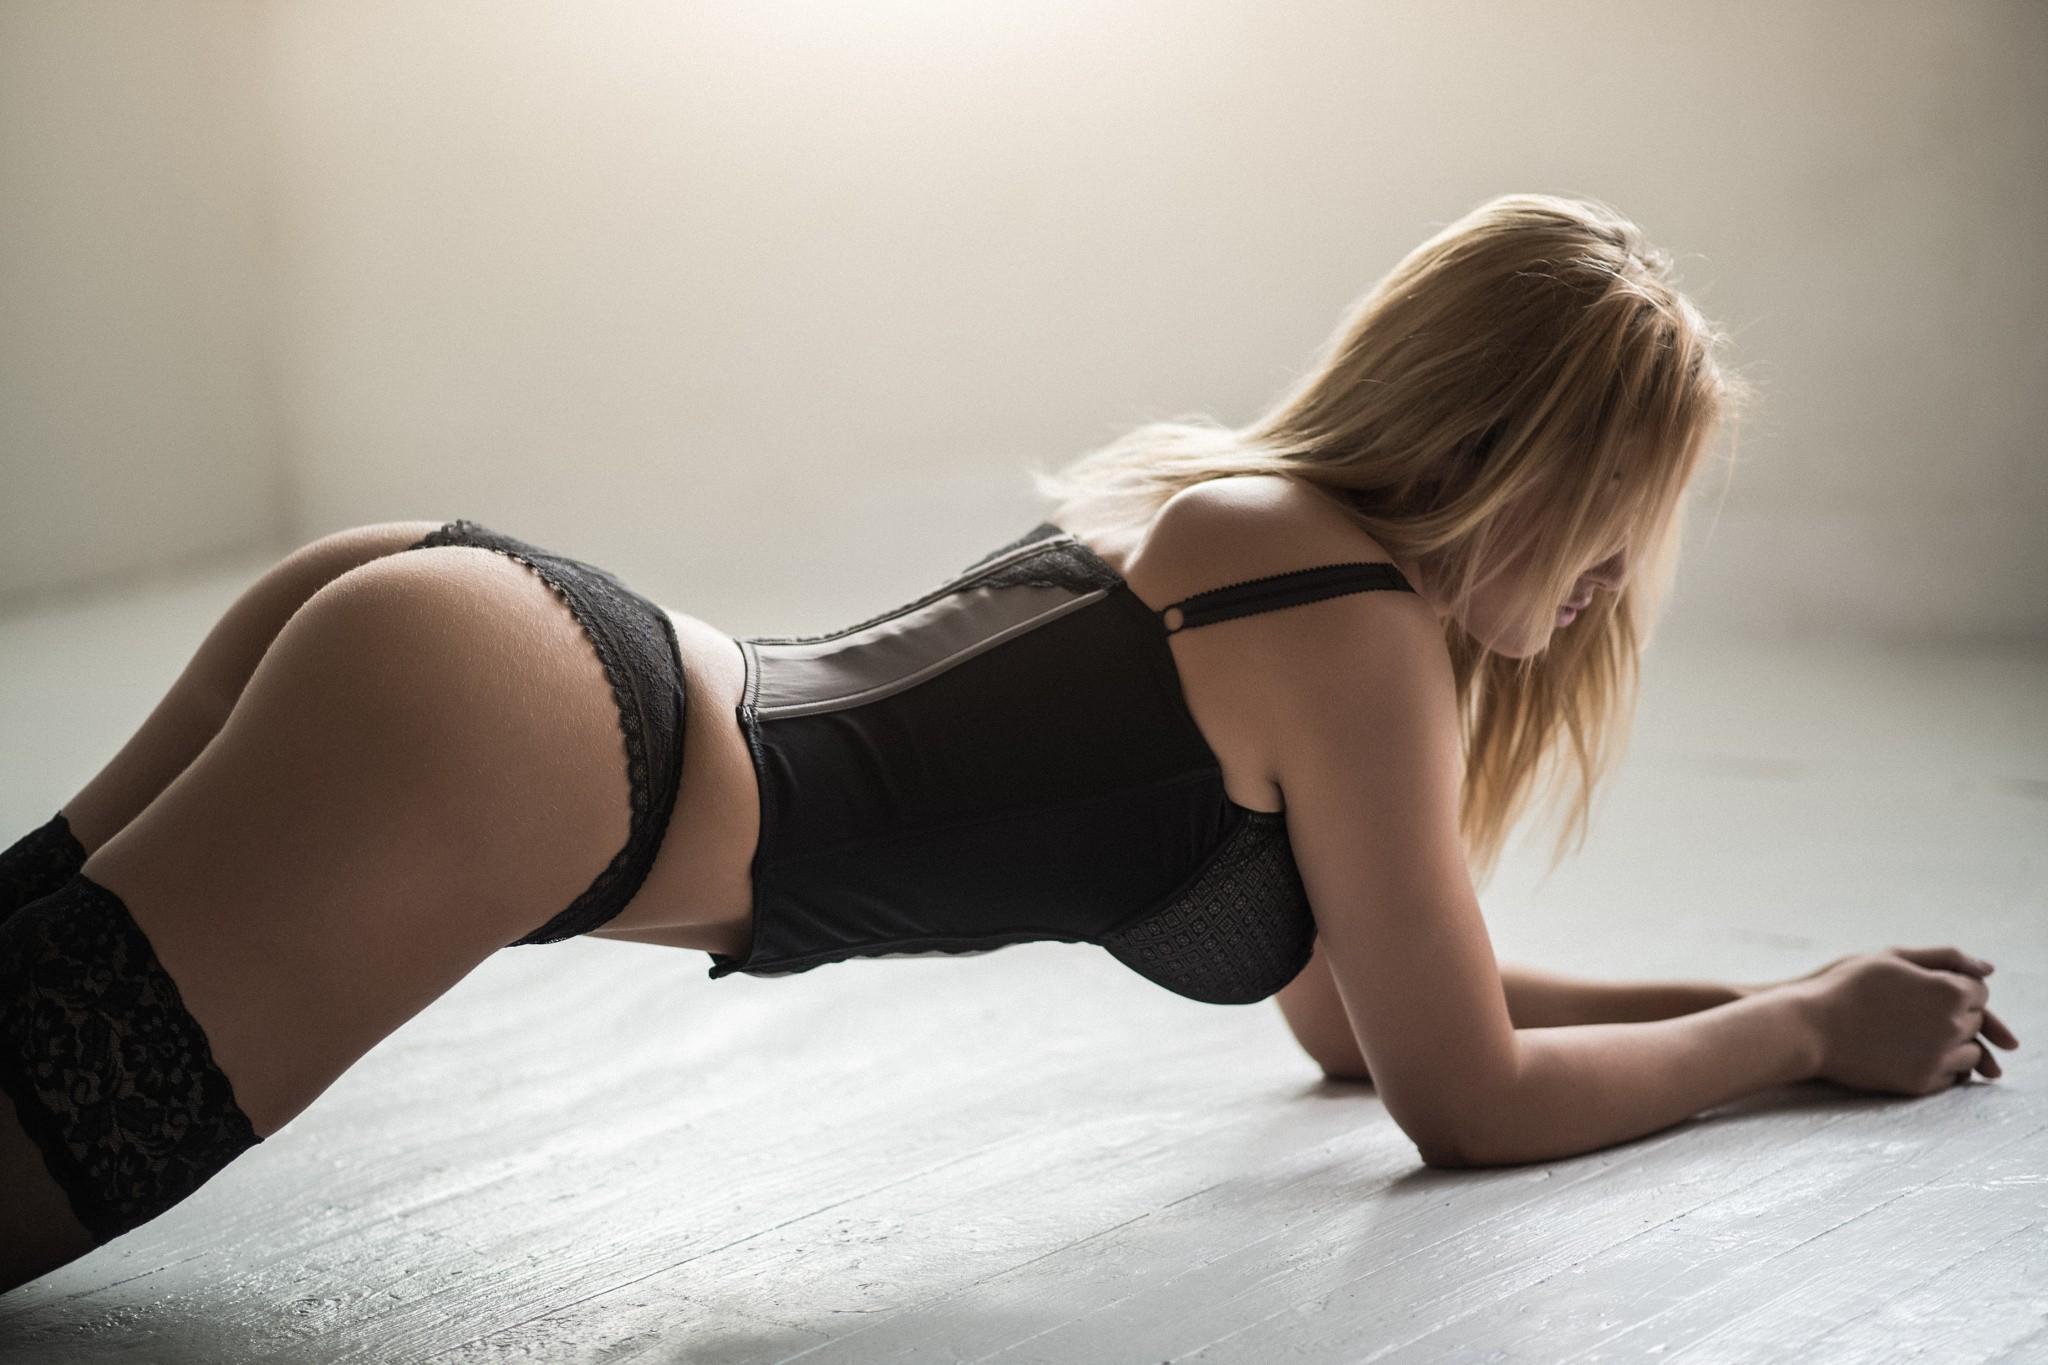 tihonechko-v-popku-foto-porno